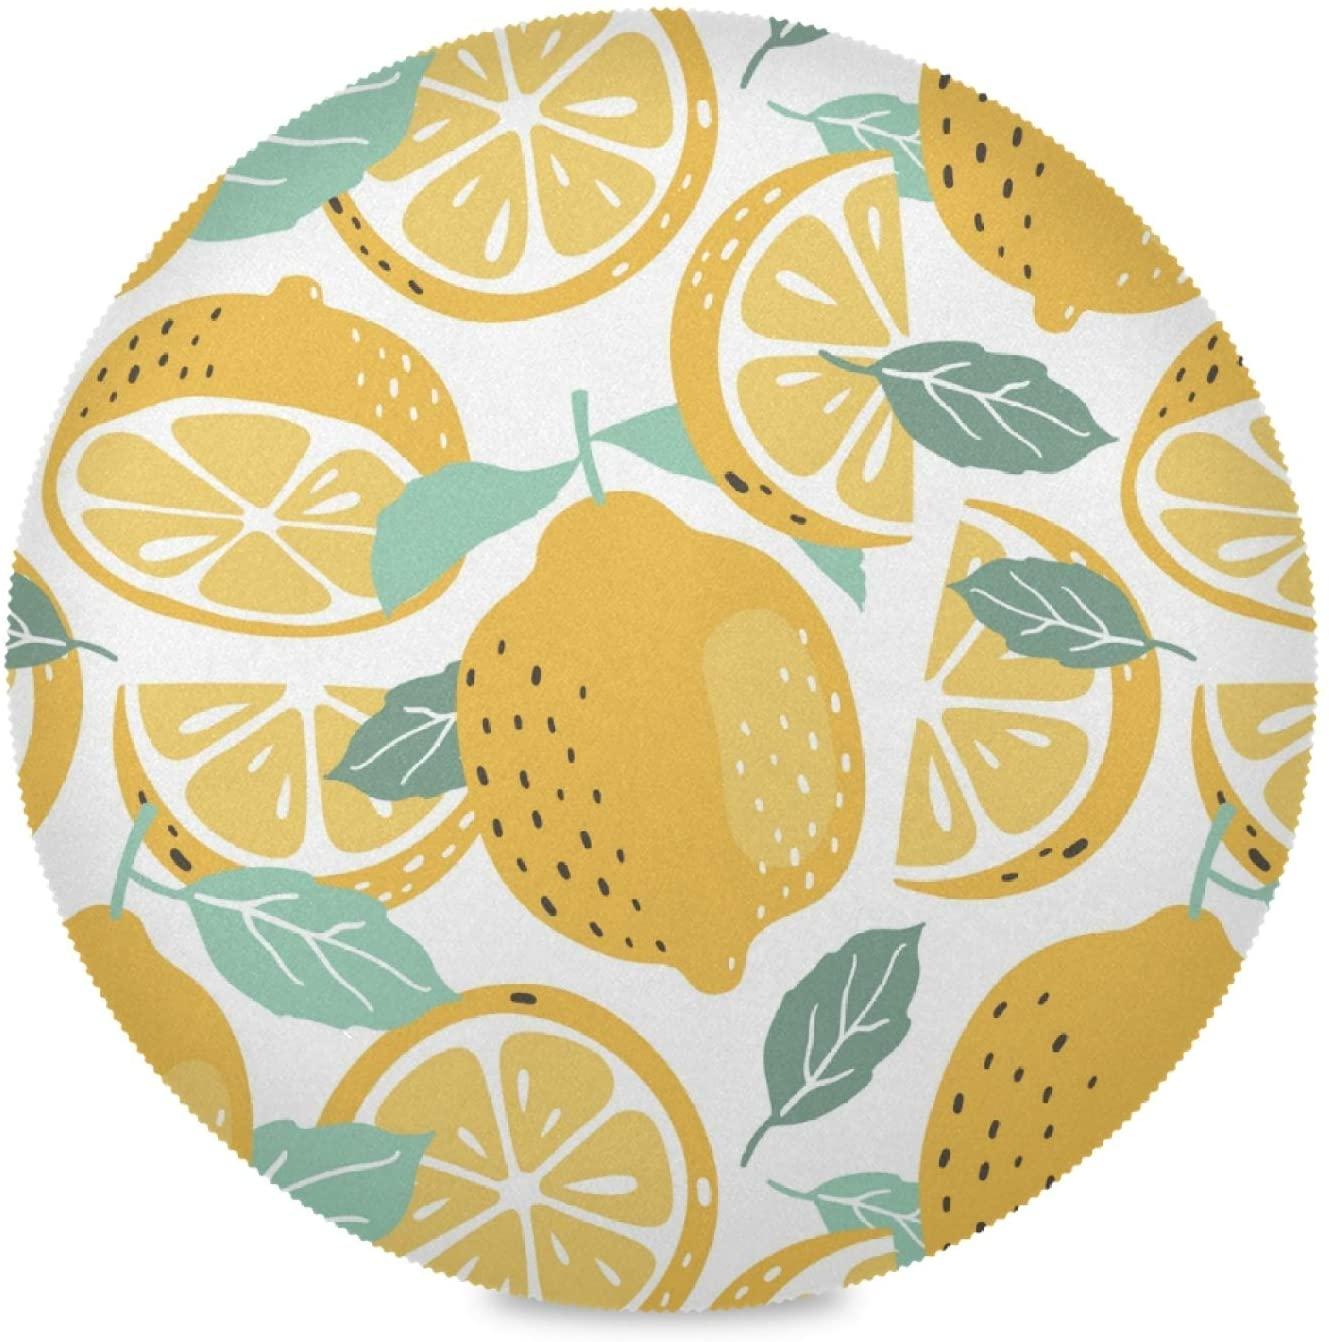 Caihoyu Lemon Yellow Round Place Mats (15.4